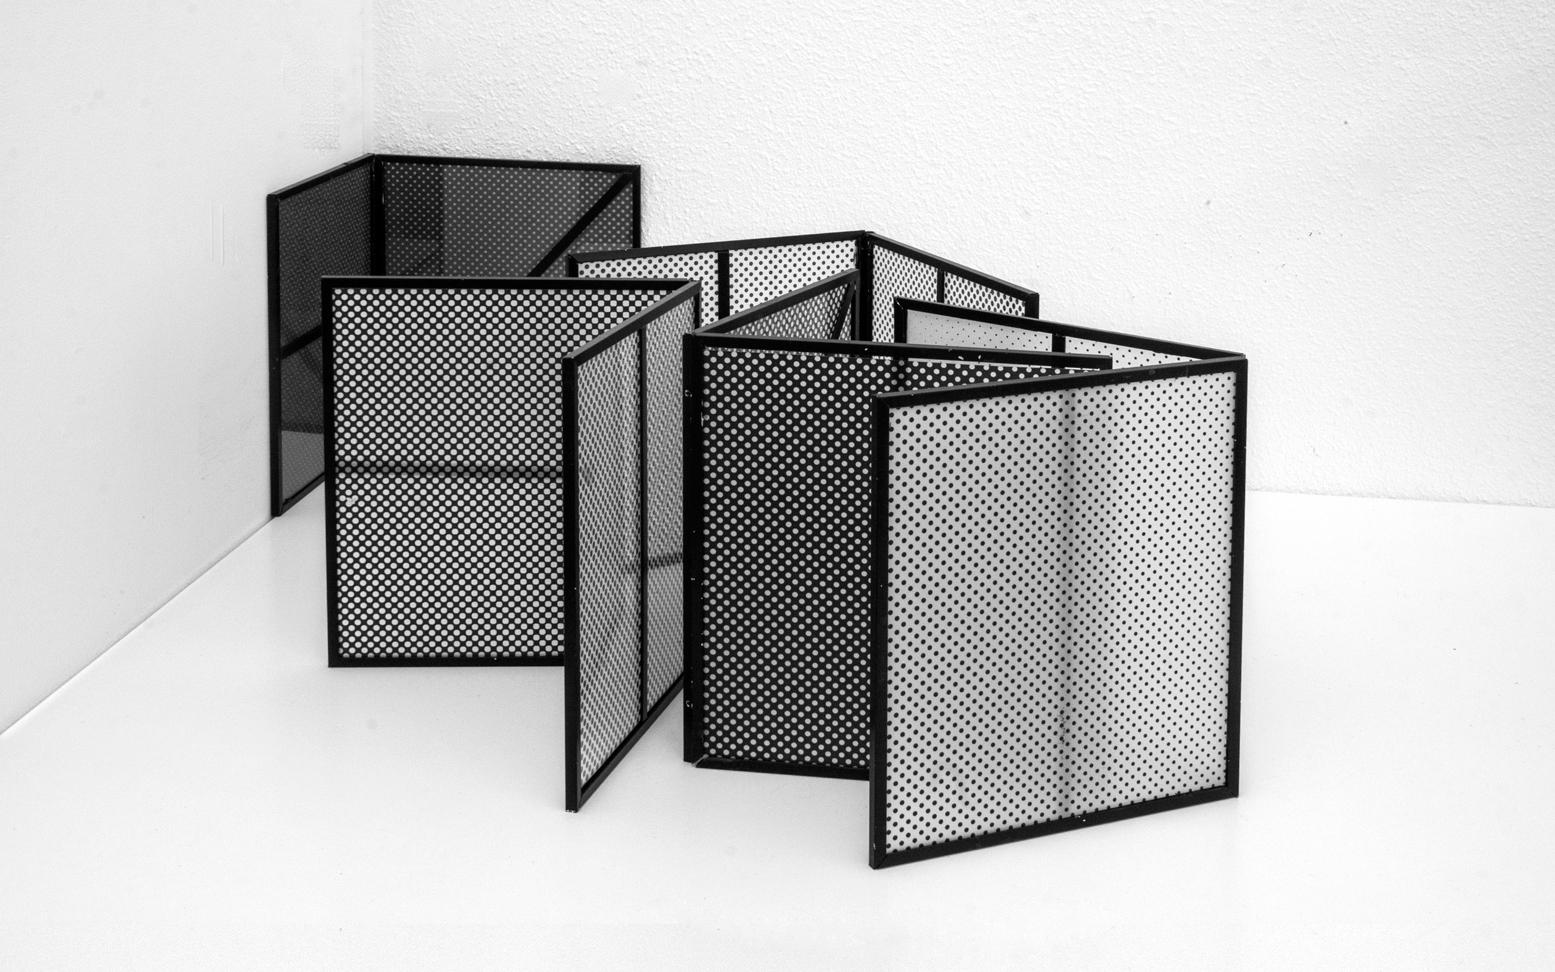 quentin_lefranc_espacemets_3